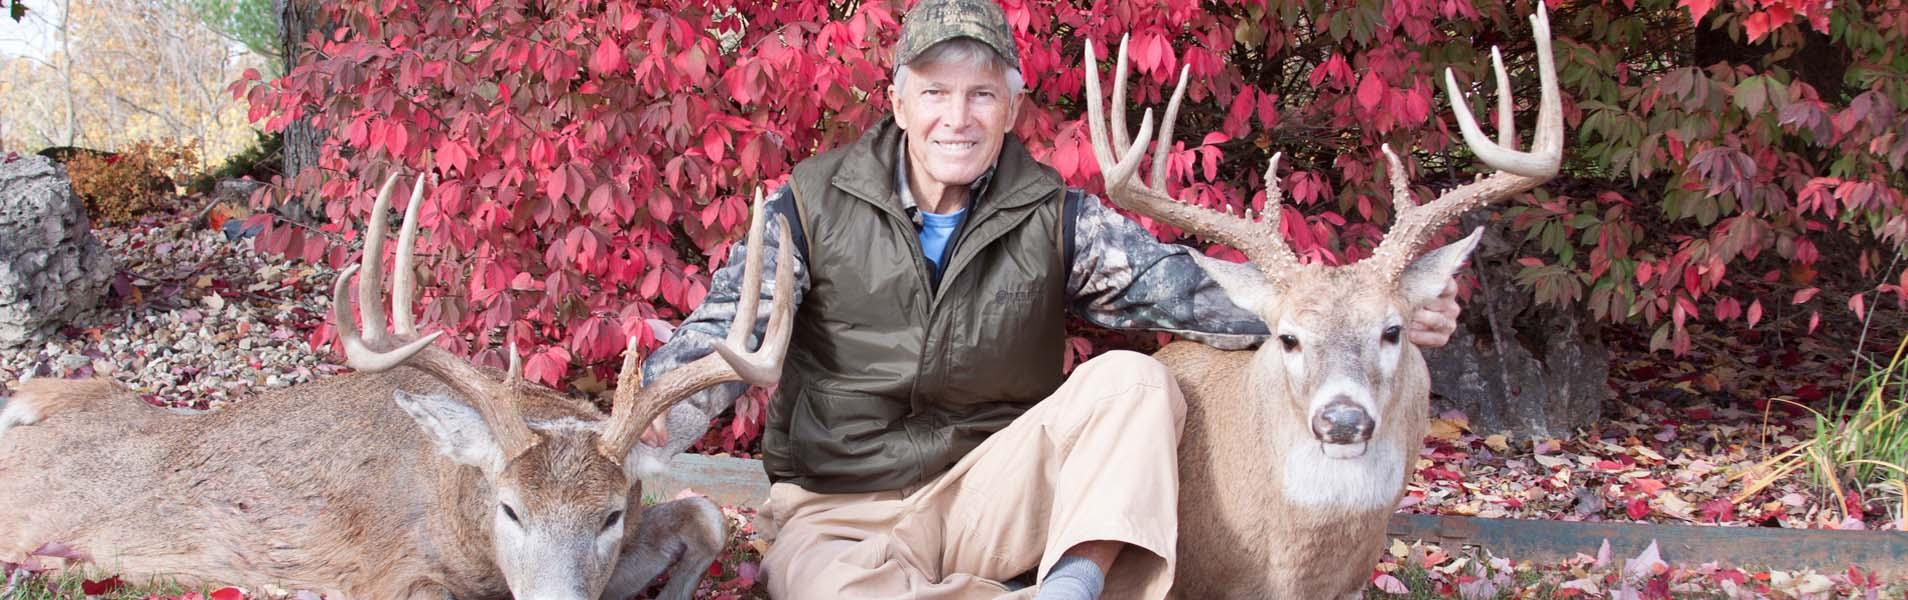 Hunting The Illinois Whitetail Rut   Heartland Lodge regarding 2021 Whitetail Rut Calendar For Virginia